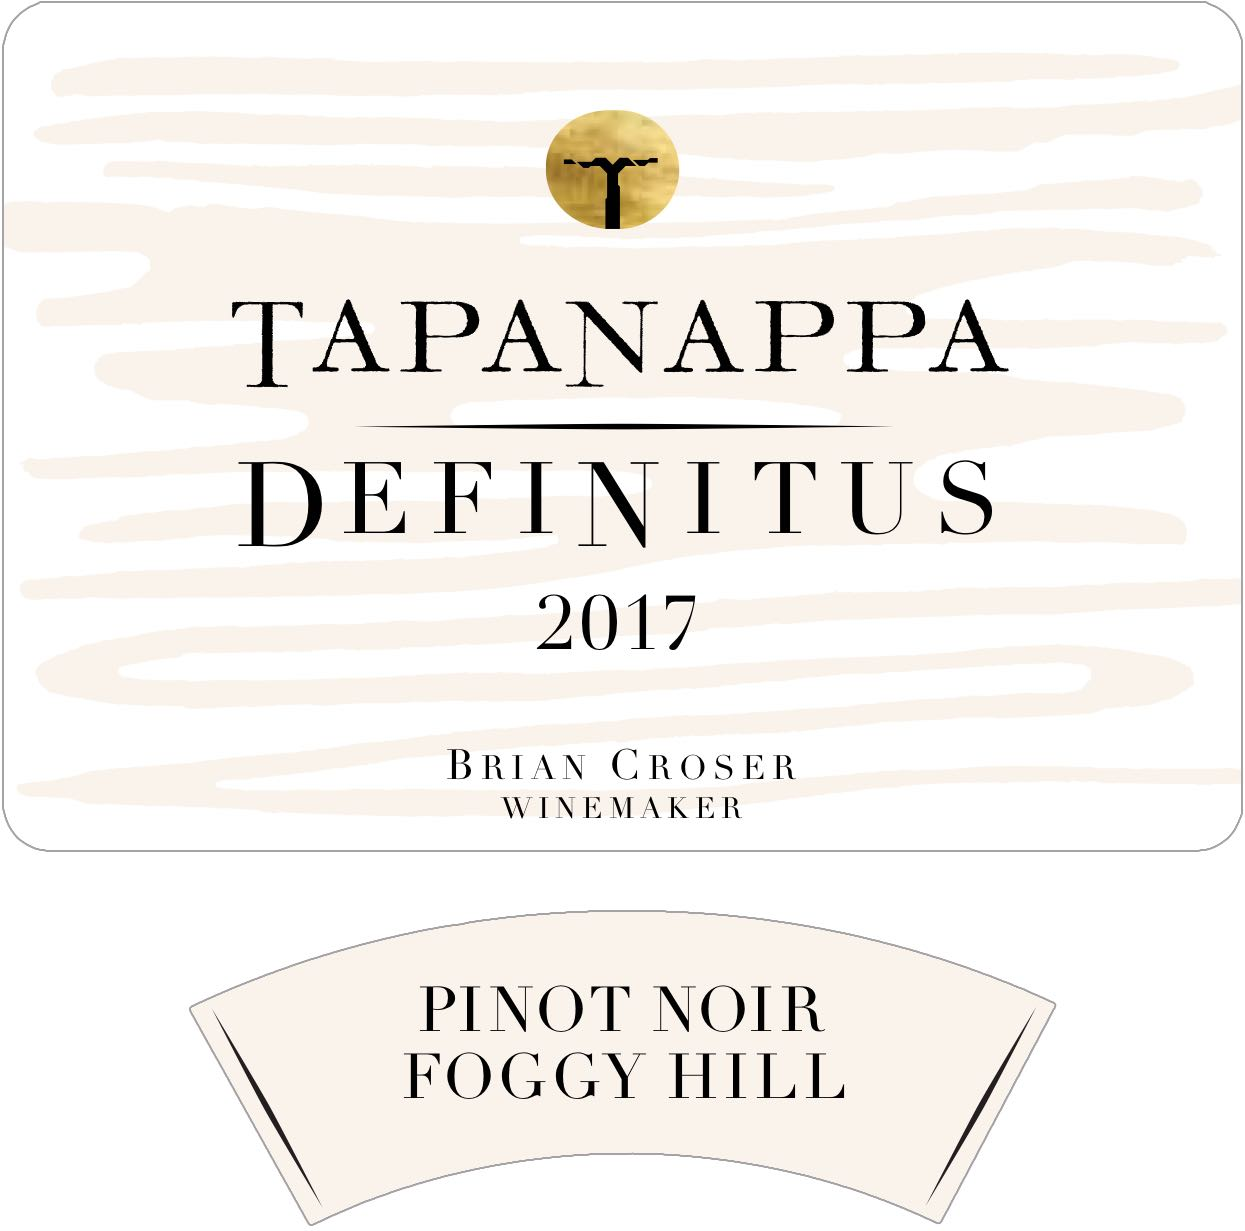 Tapanappa Foggy Hill Vineyard 2017 Definitus Pinot Noir Label